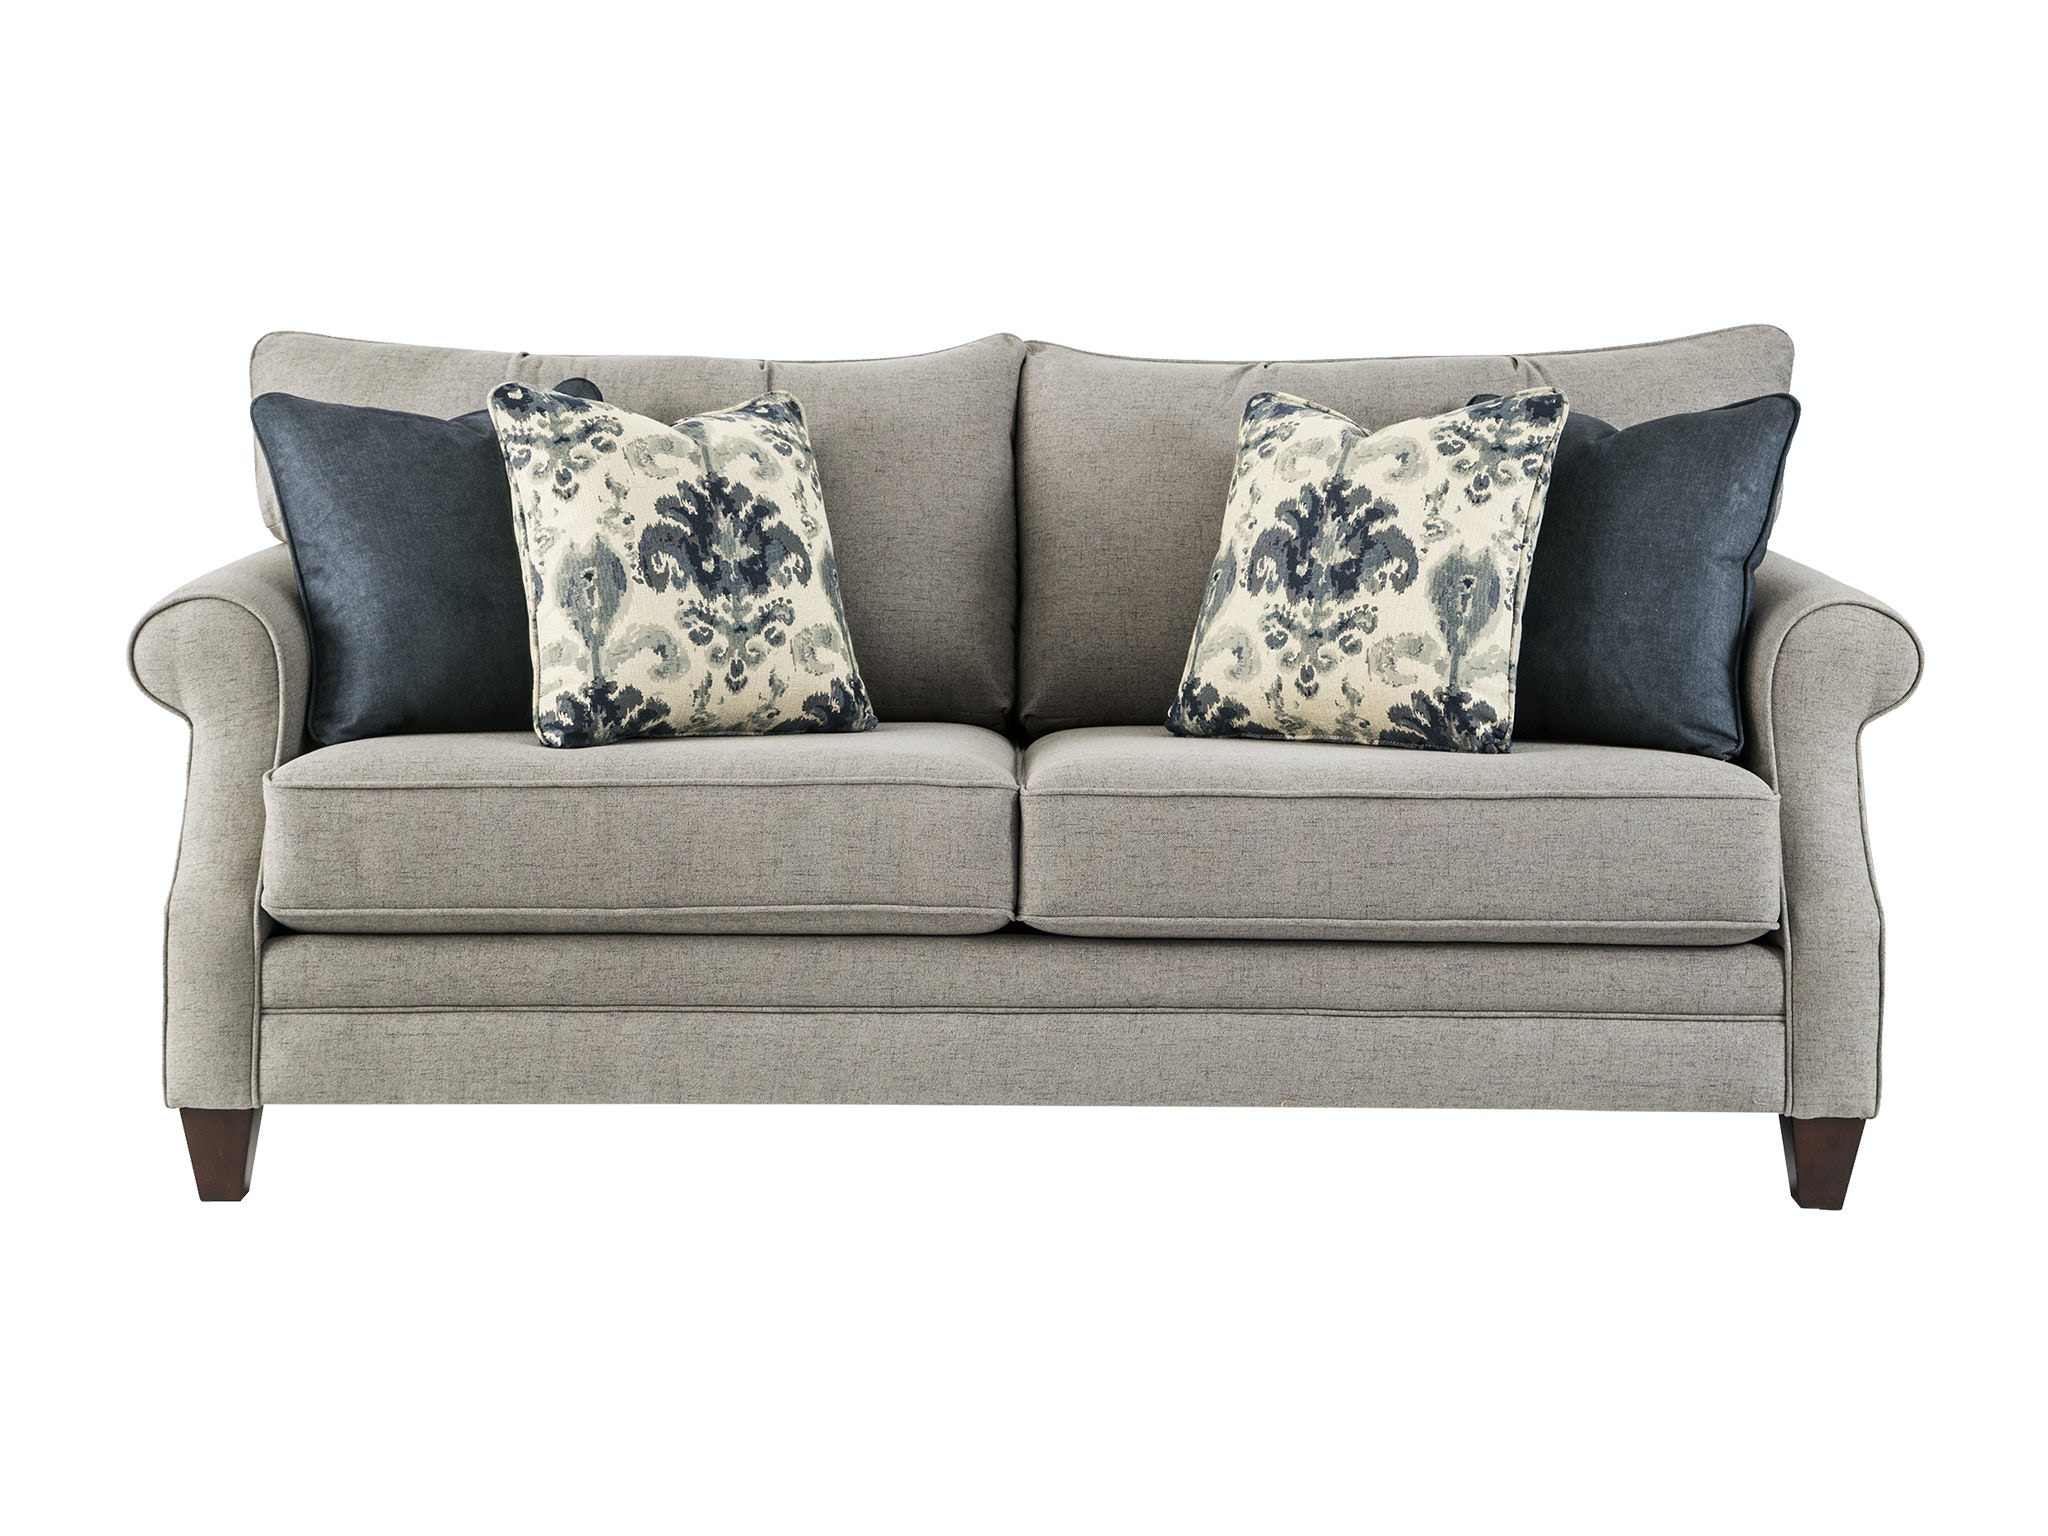 Craftmaster Living Room Sleeper Sofa 77685068 CraftMaster